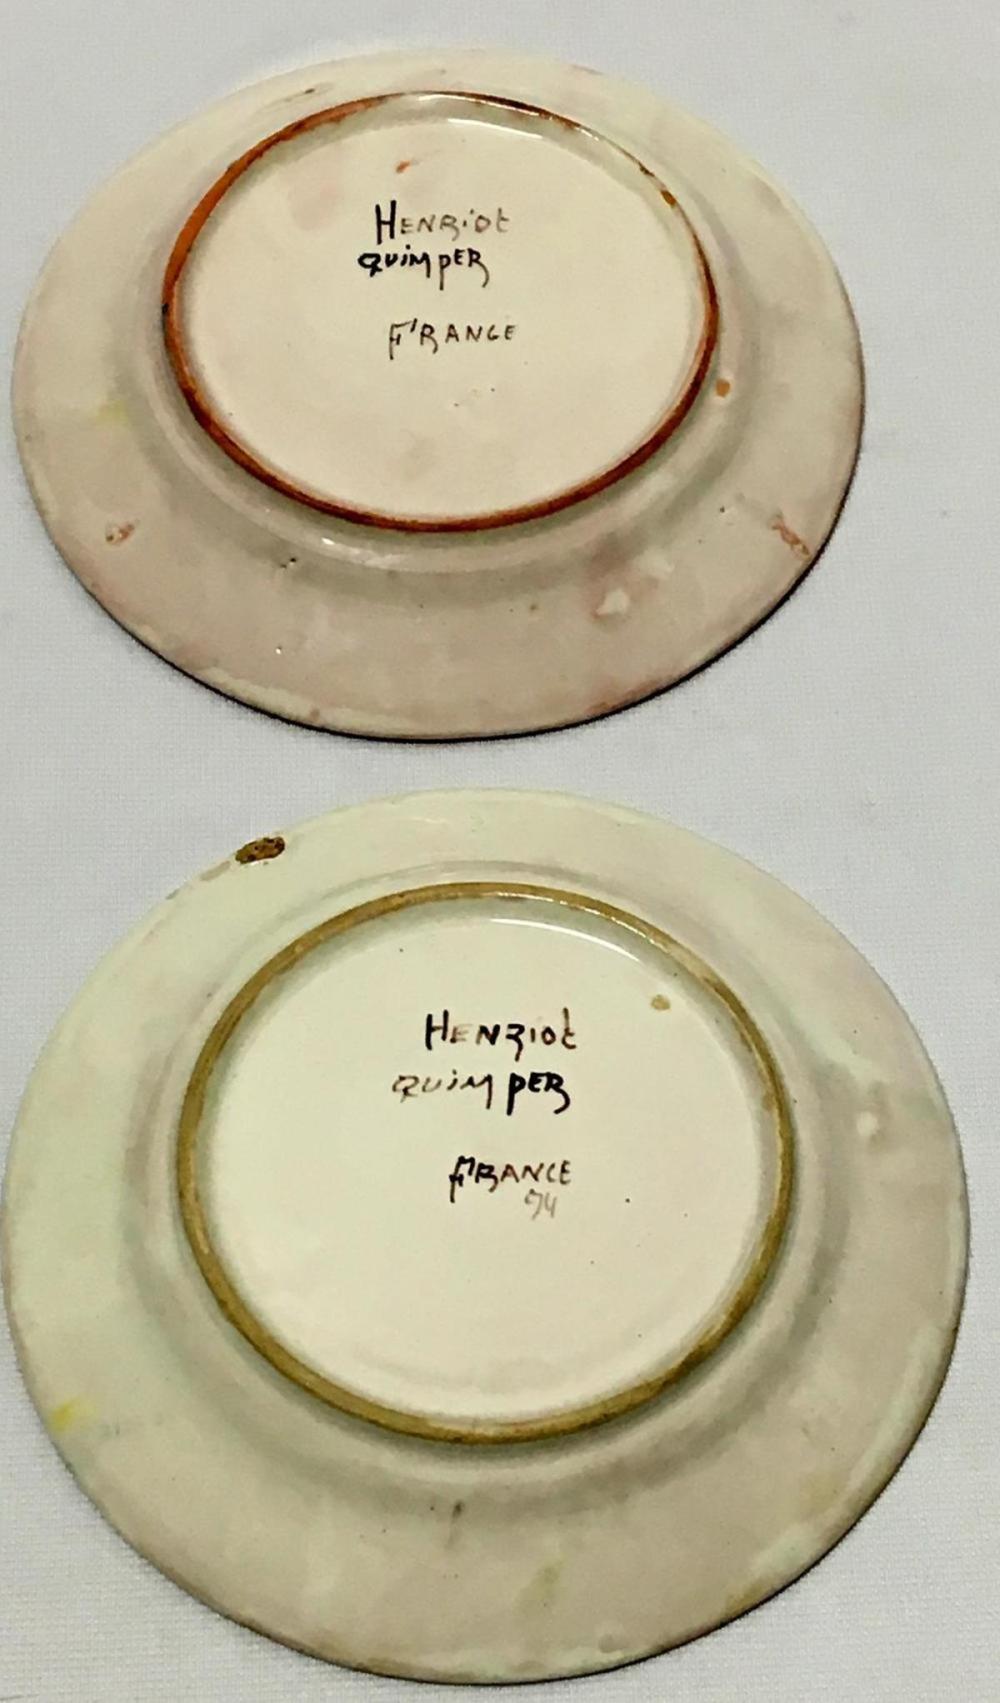 Antique Lot Of 2 Henriot Quimper Hand Painted Plates 6-7/8